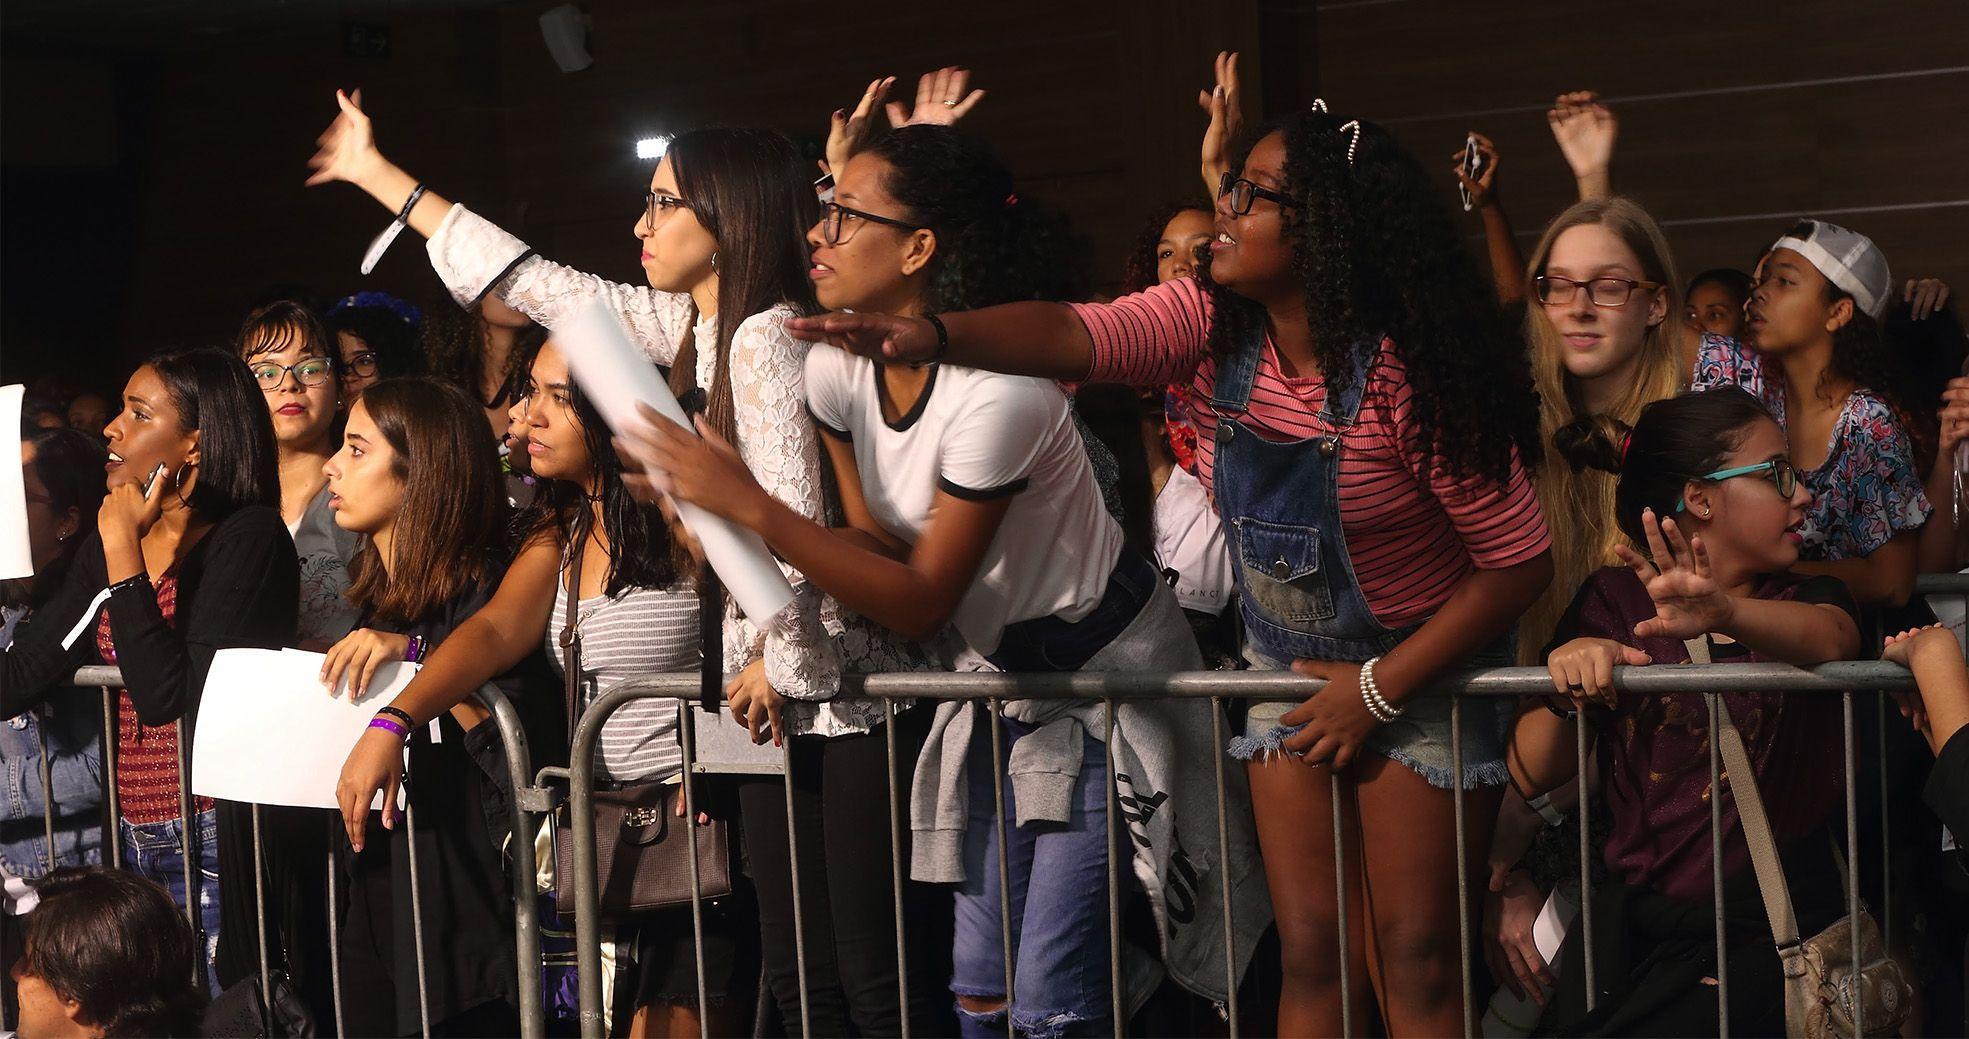 Show - Blanc7 Turnê Big Picture Rio - Agência DosReis Live Marketing